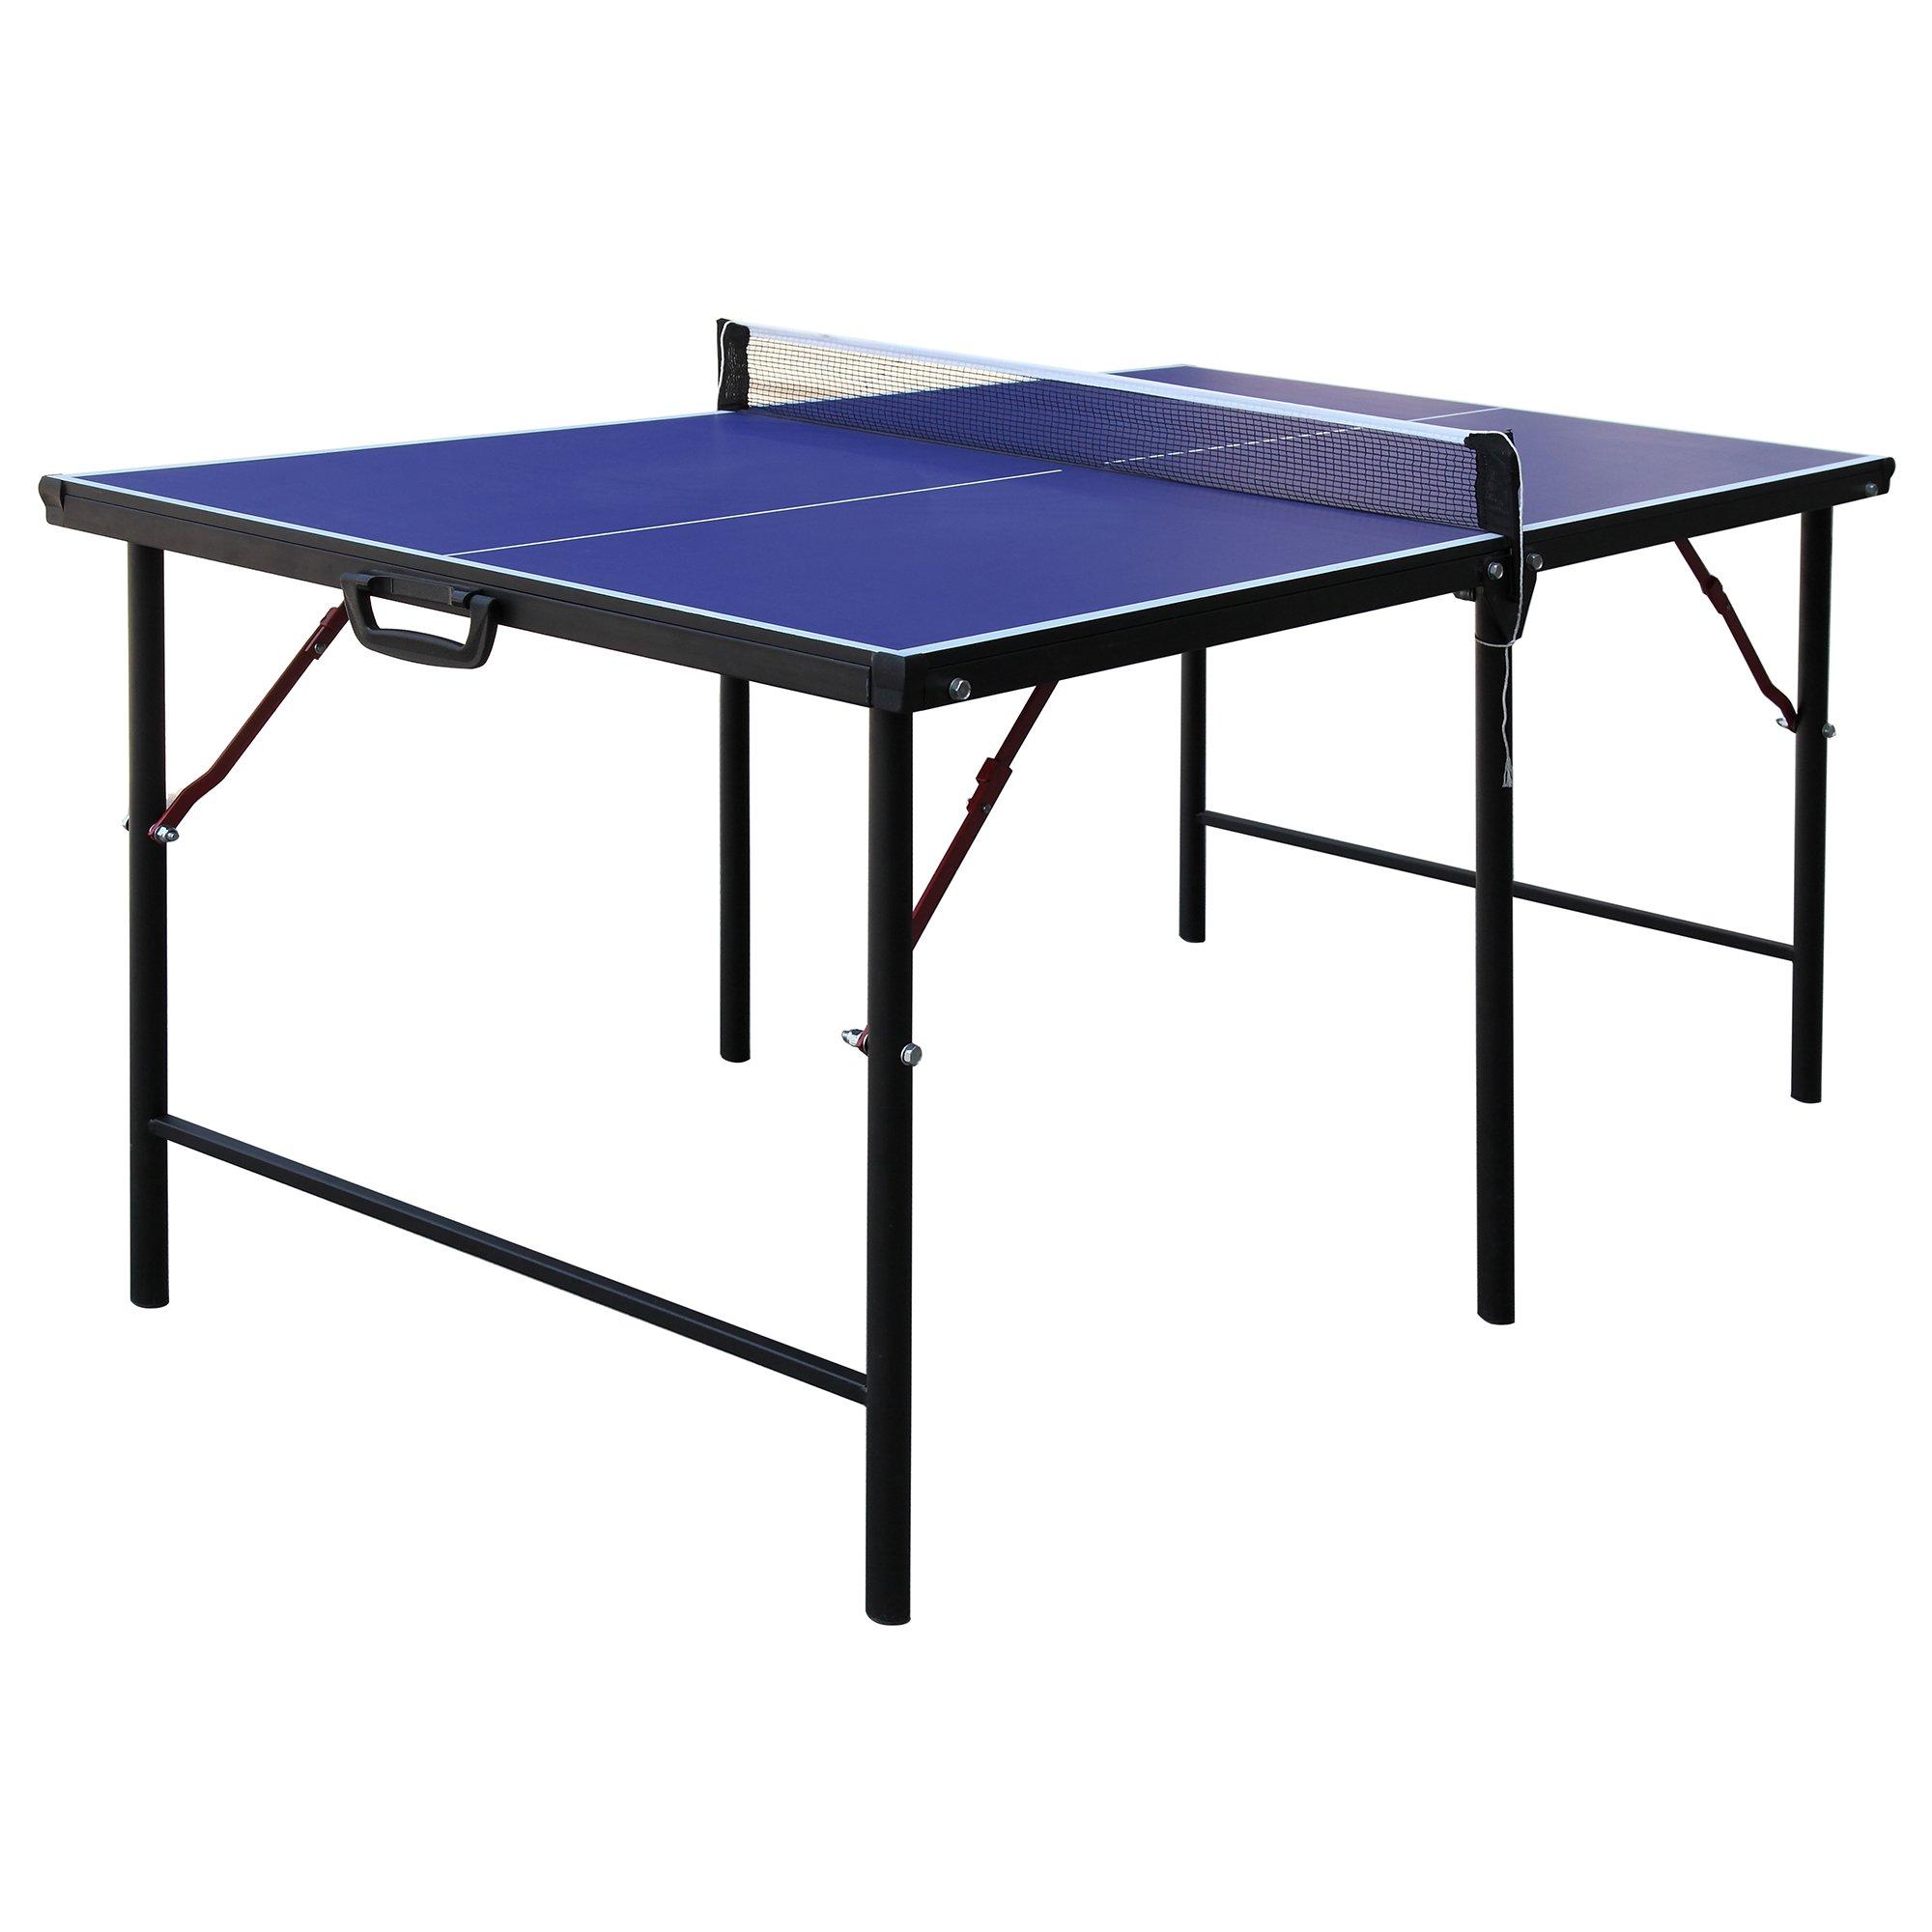 Hathaway Crossover Folding Portable Tennis